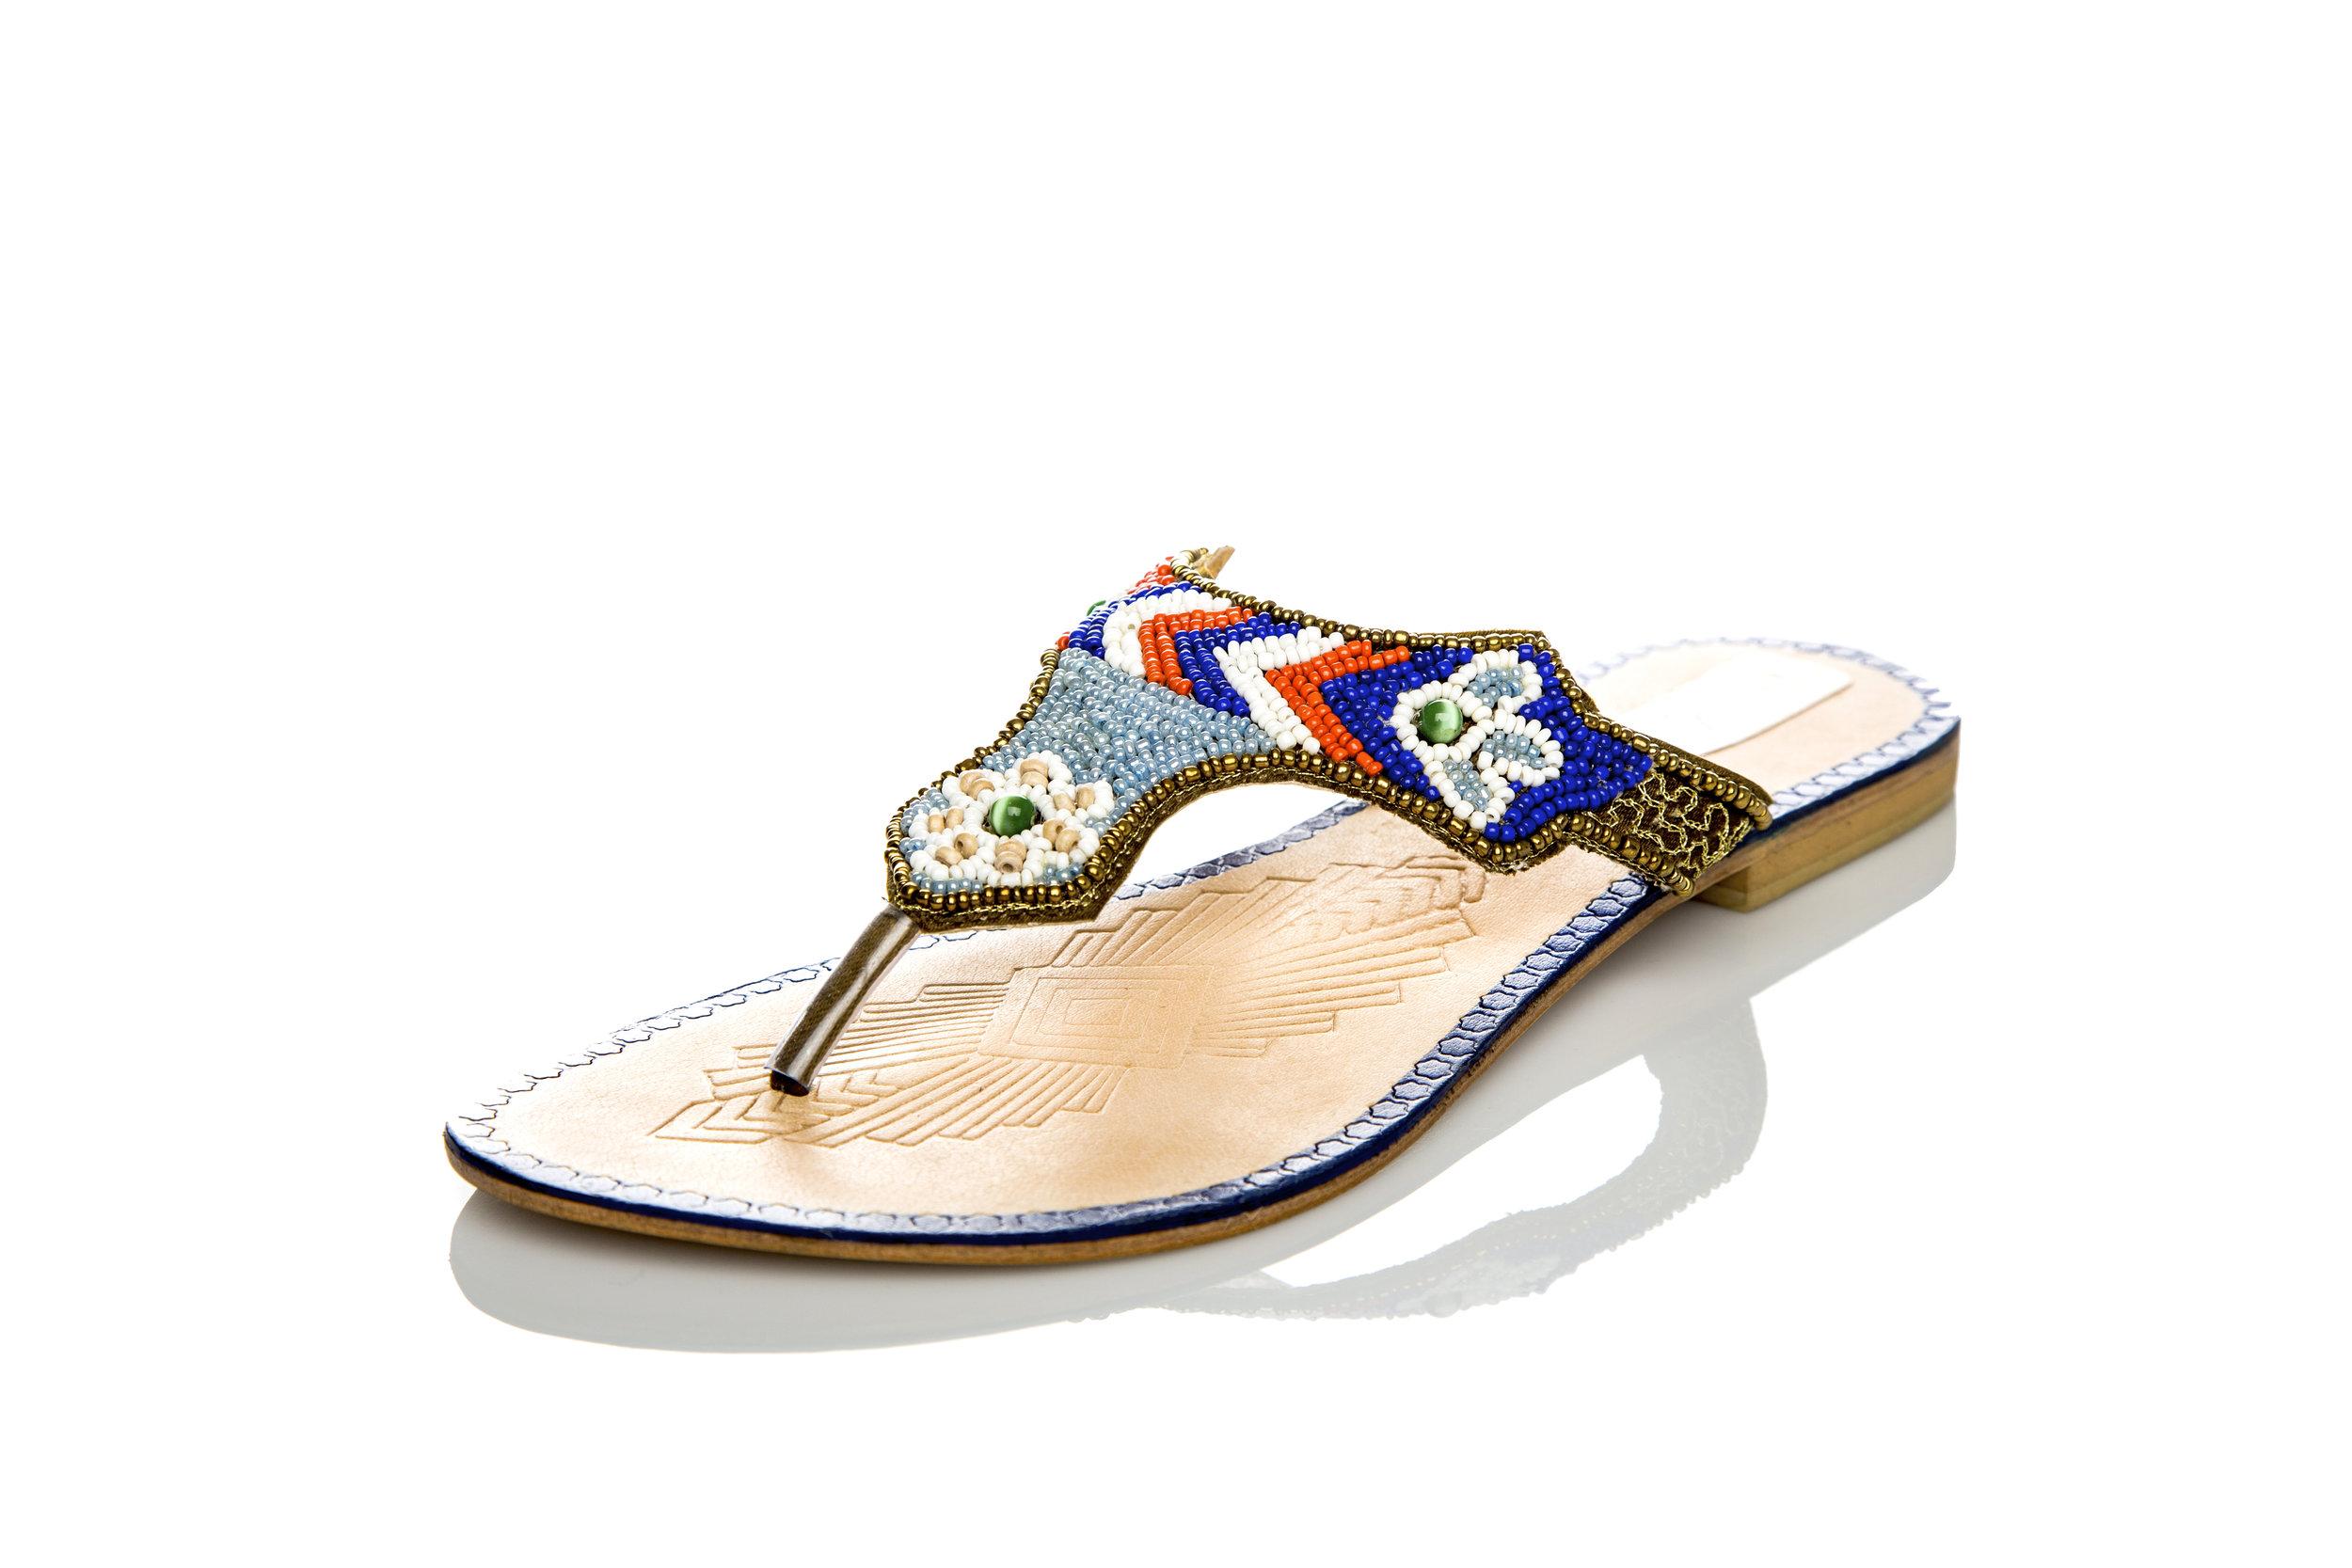 64320efd4 shaizy sy shoes zulu african indian beads beaded shoes beautiful women s  sandals summer beach flip flops